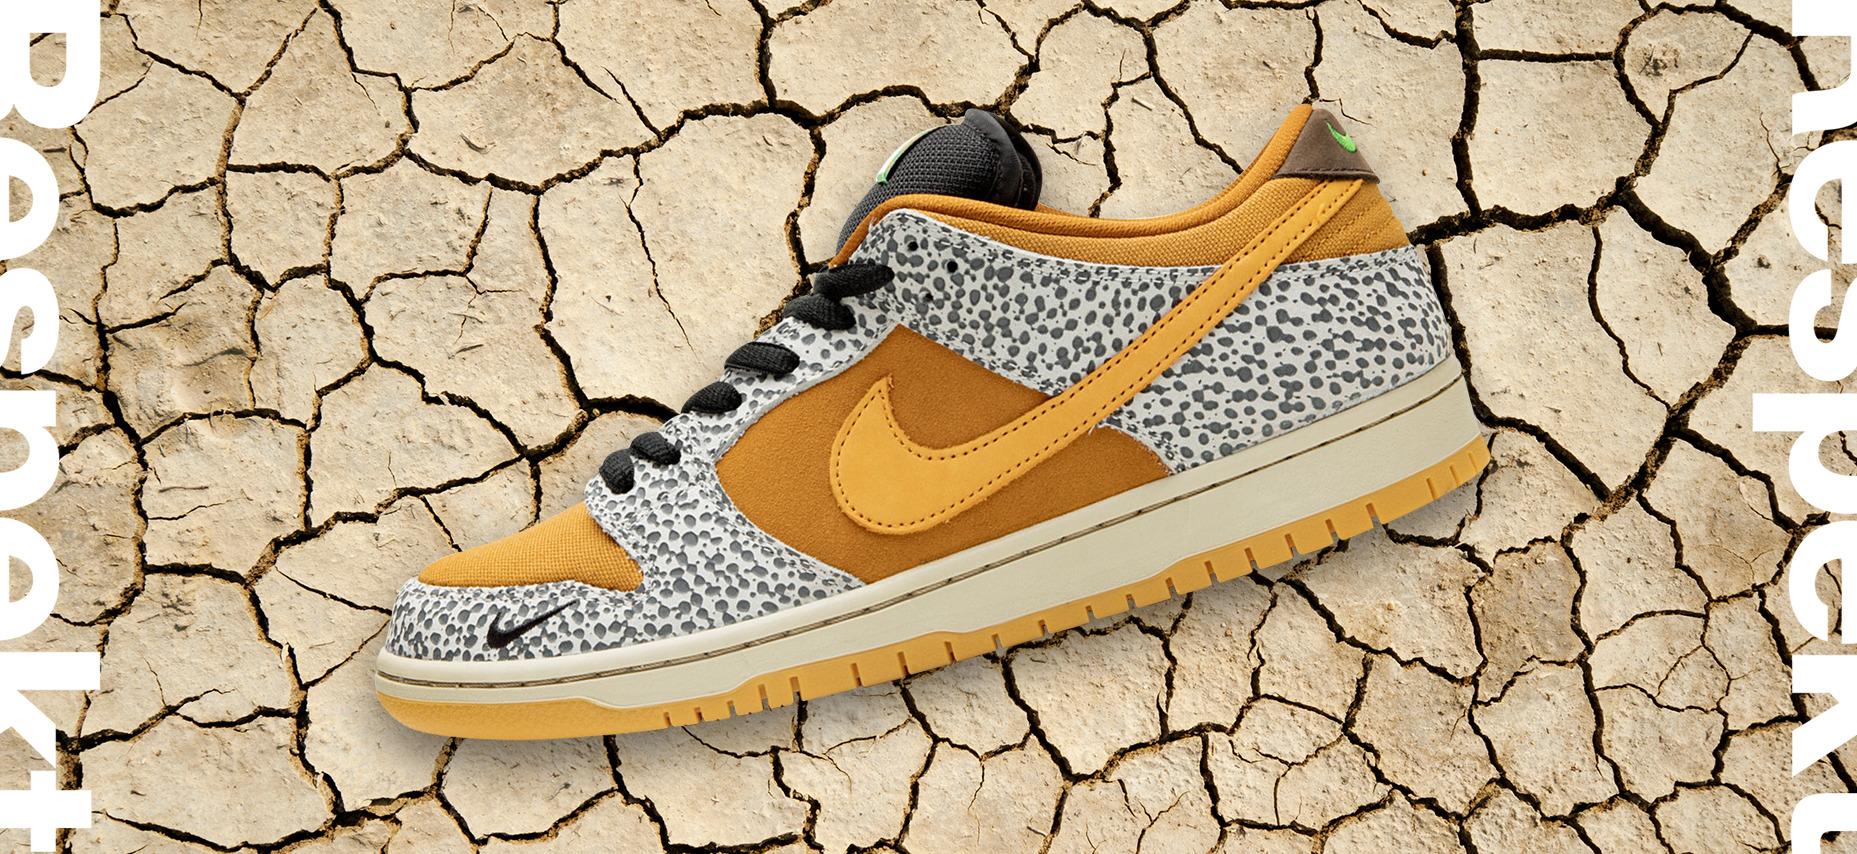 Nike SB Dunk Low – Wir gehen auf Safari 4